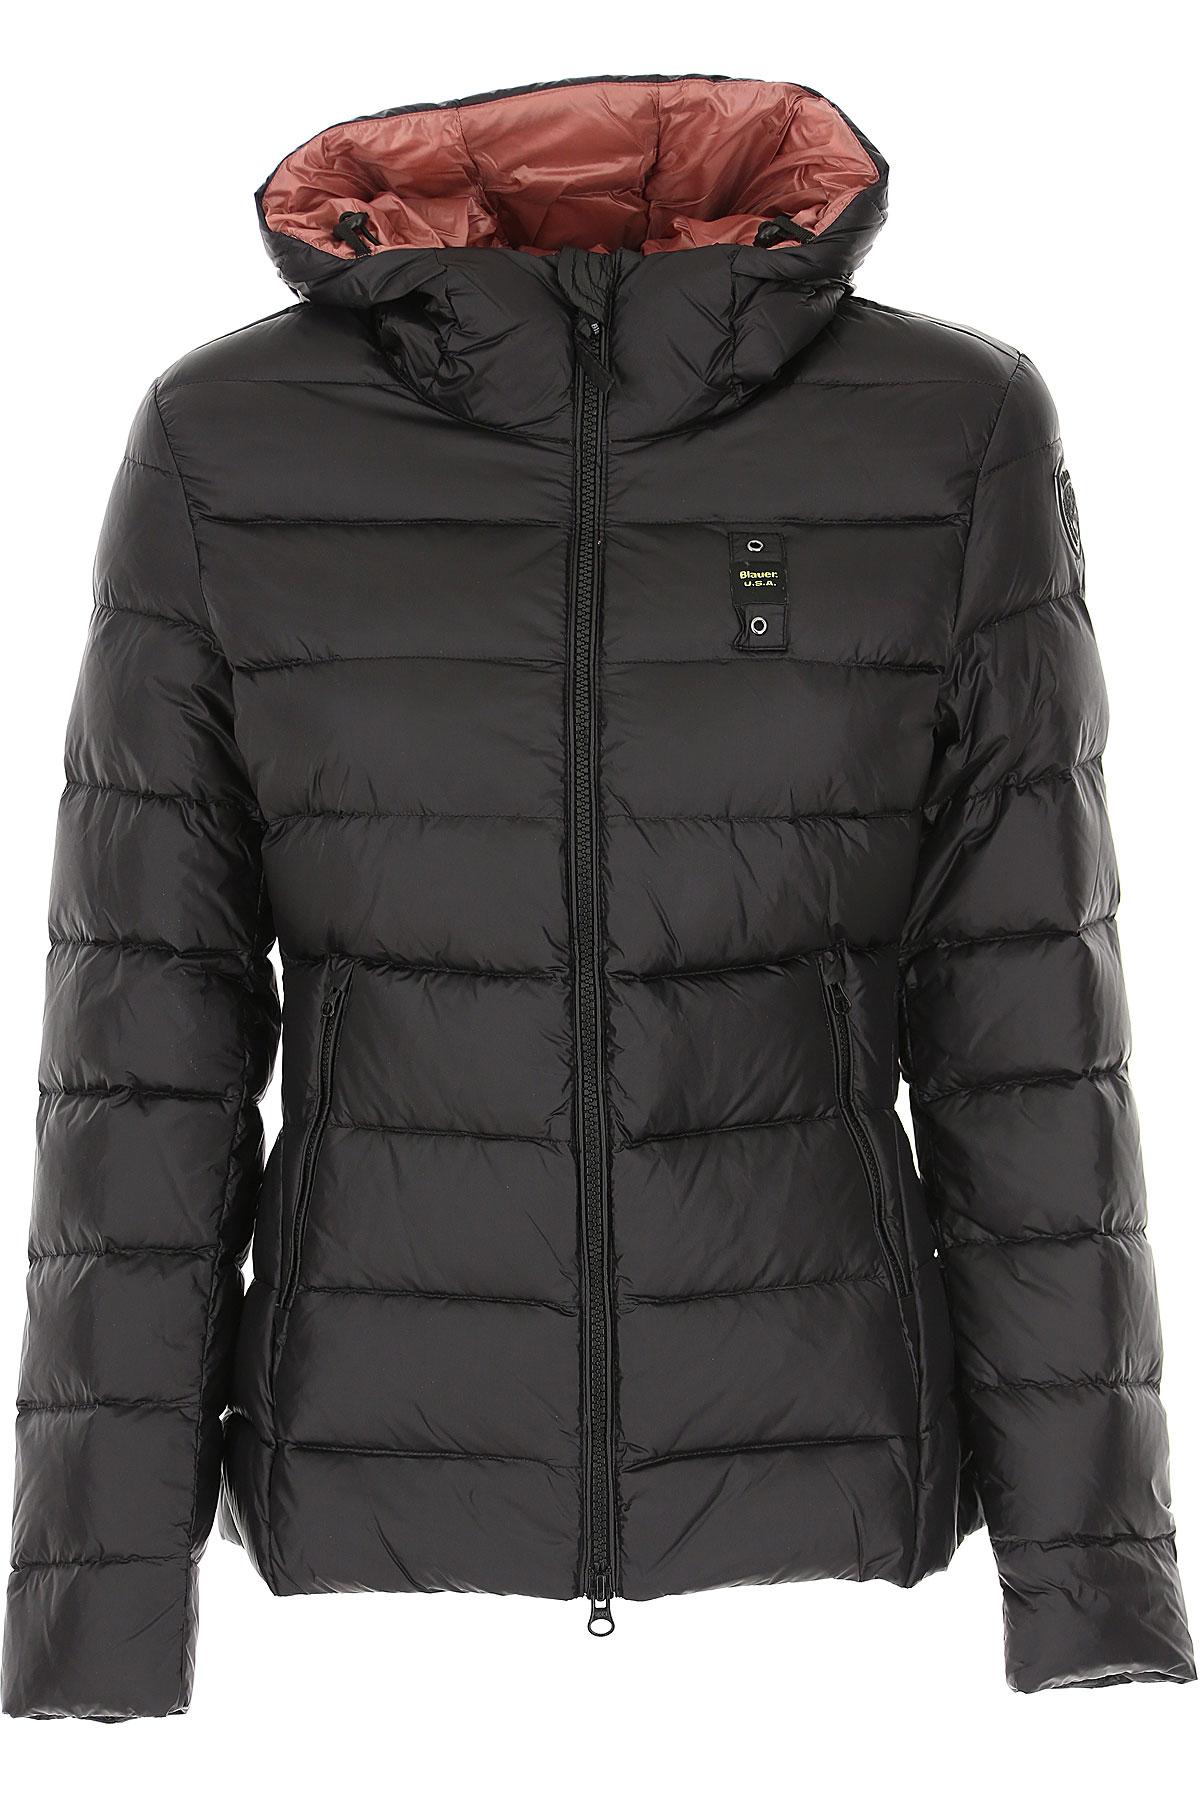 Blauer Down Jacket for Women, Puffer Ski Jacket On Sale, Black, polyester, 2019, 10 2 6 8